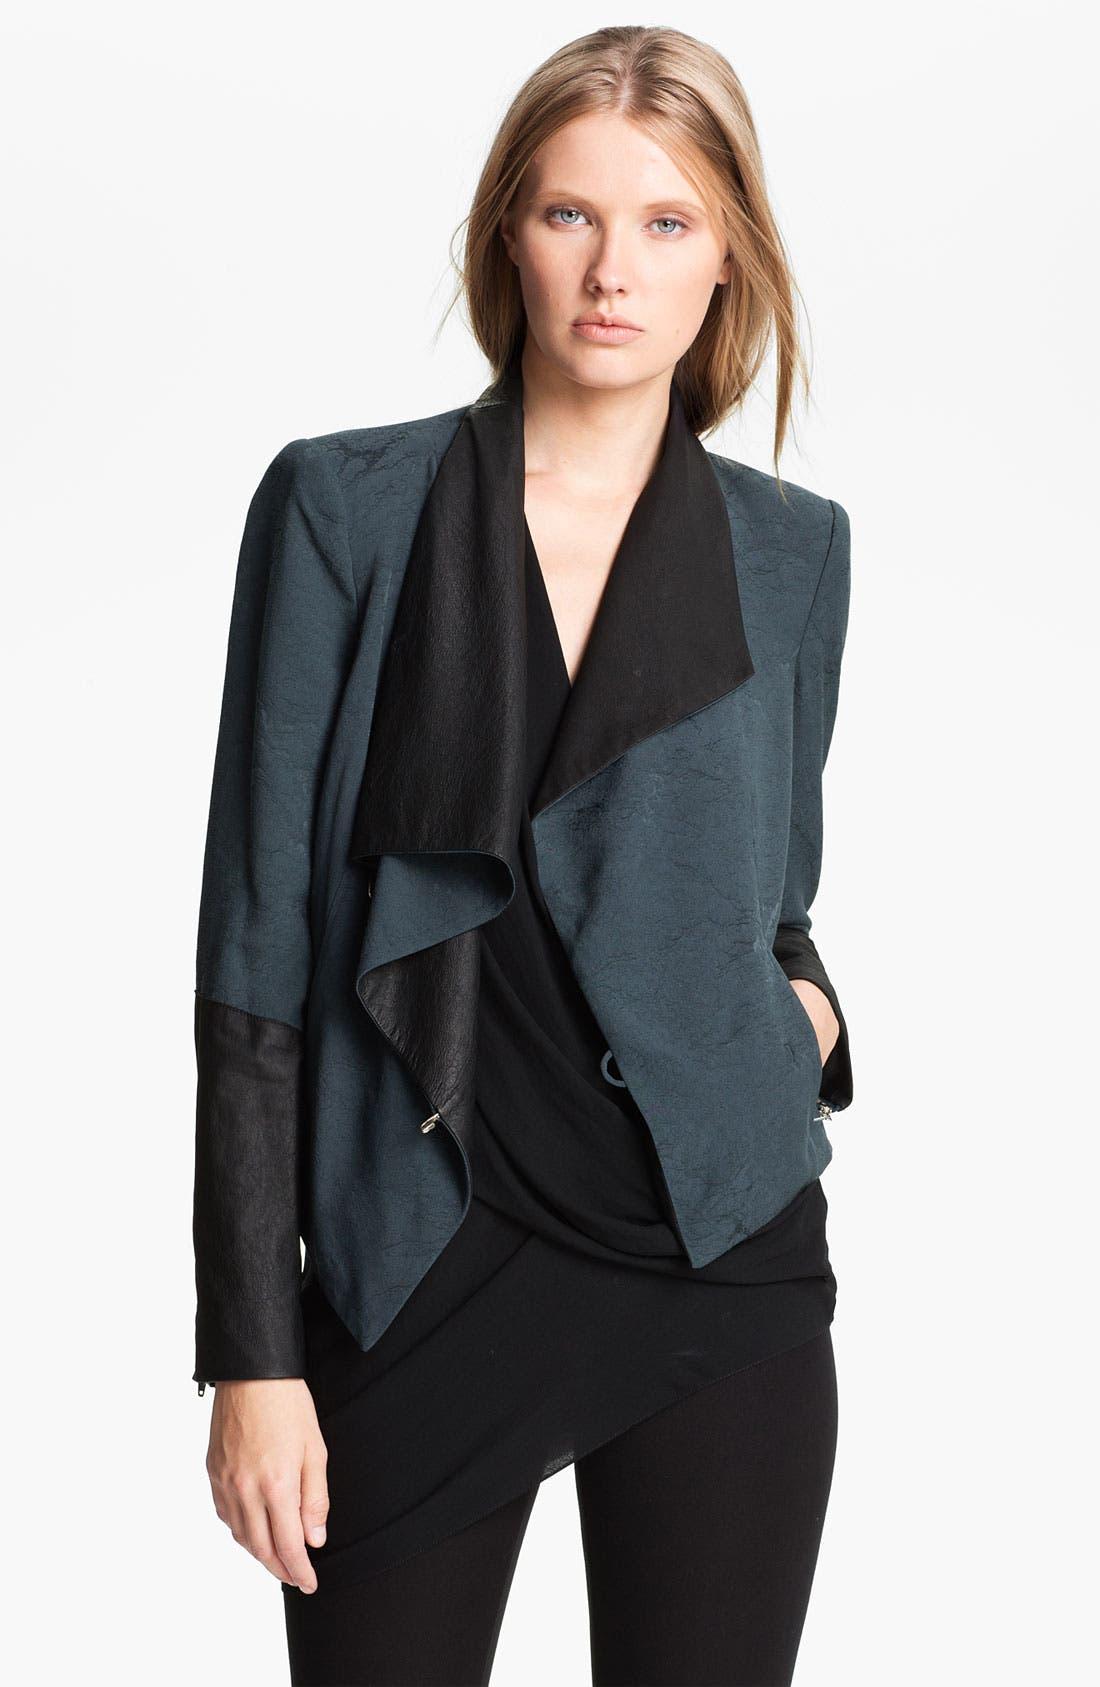 Main Image - Helmut Lang 'Perma' Jacquard & Leather Jacket